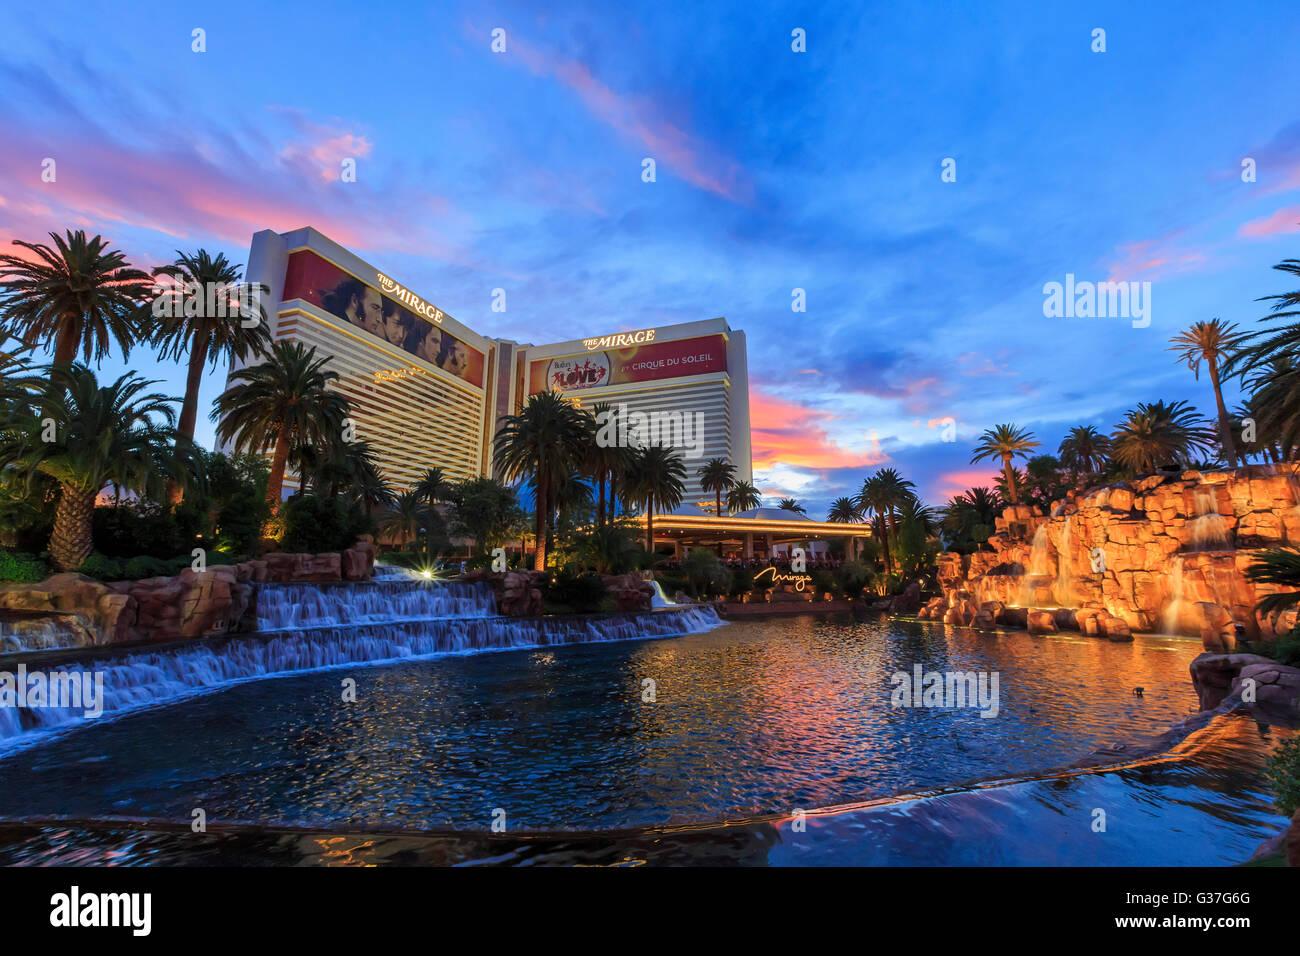 AUG 5, Las Vegas: The famous Mirage Casino on AUG 5, 2015 at Las Vegas, Nevada - Stock Image